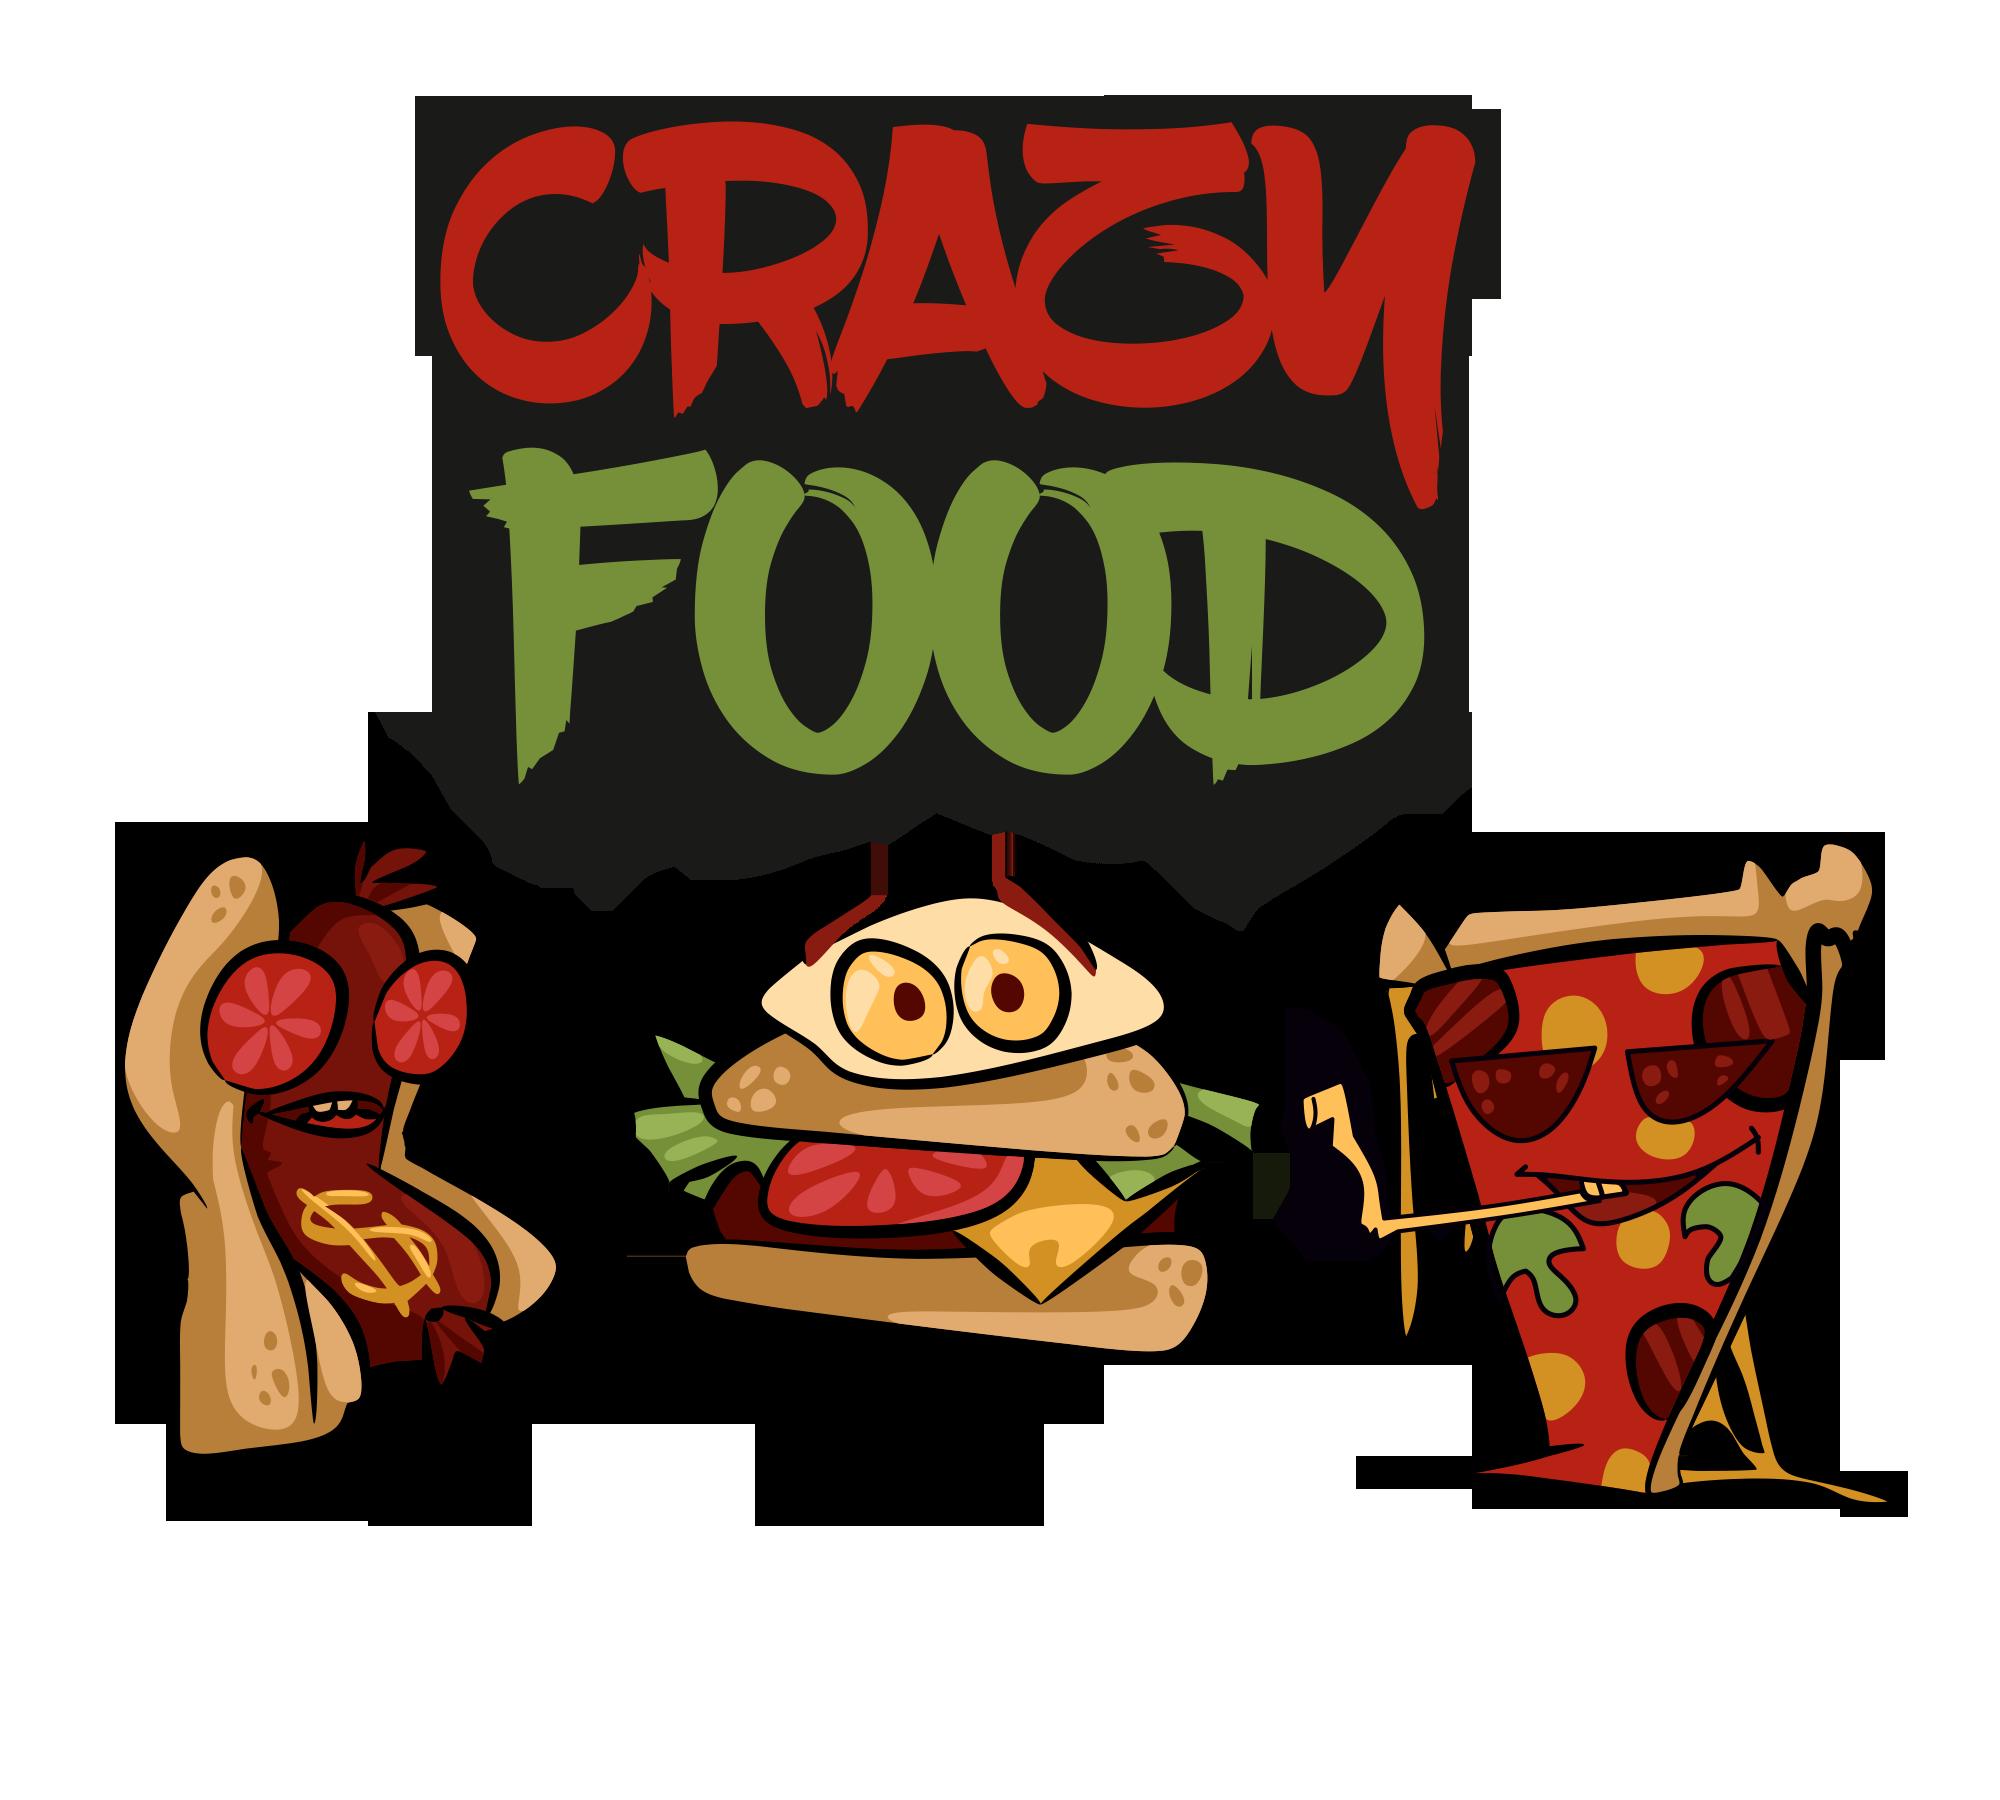 Разработать логотип и персонажа для кафе фото f_435595677abe6f9c.png